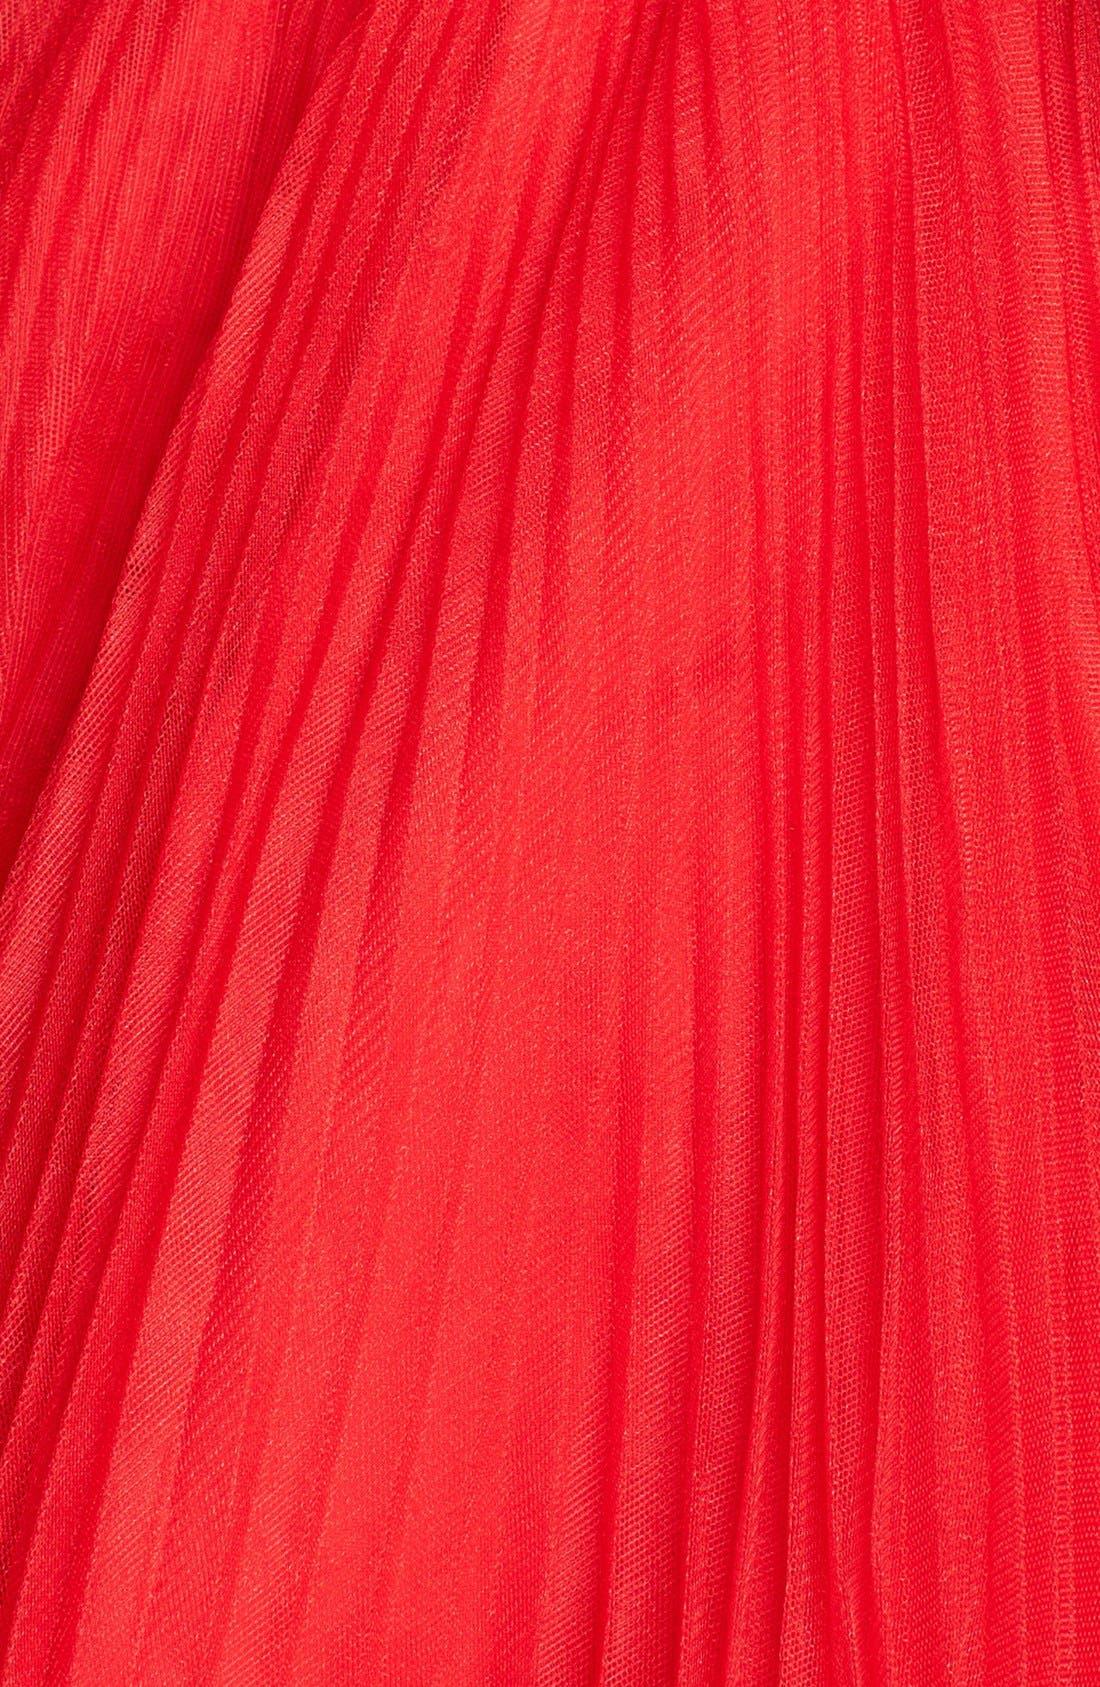 Alternate Image 3  - Sherri Hill Embellished Tulle Fit & Flare Dress (Online Exclusive)